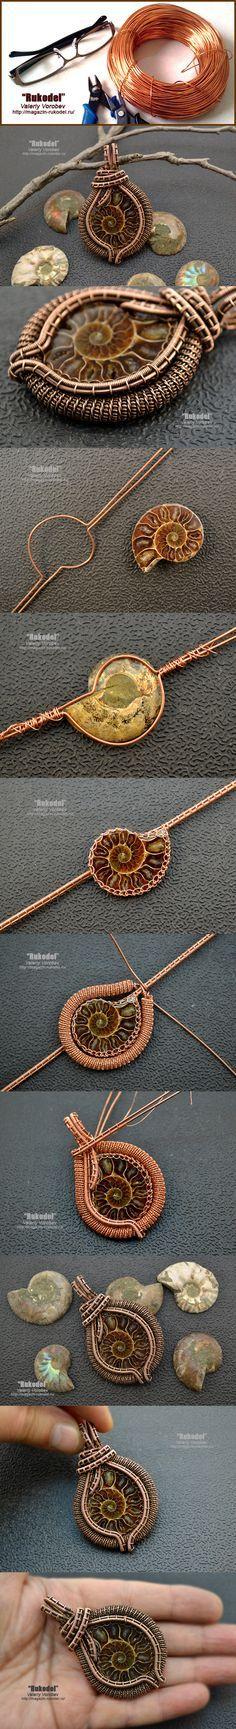 weaving around an ammonite picture tute #Wire #Jewelry #Tutorials